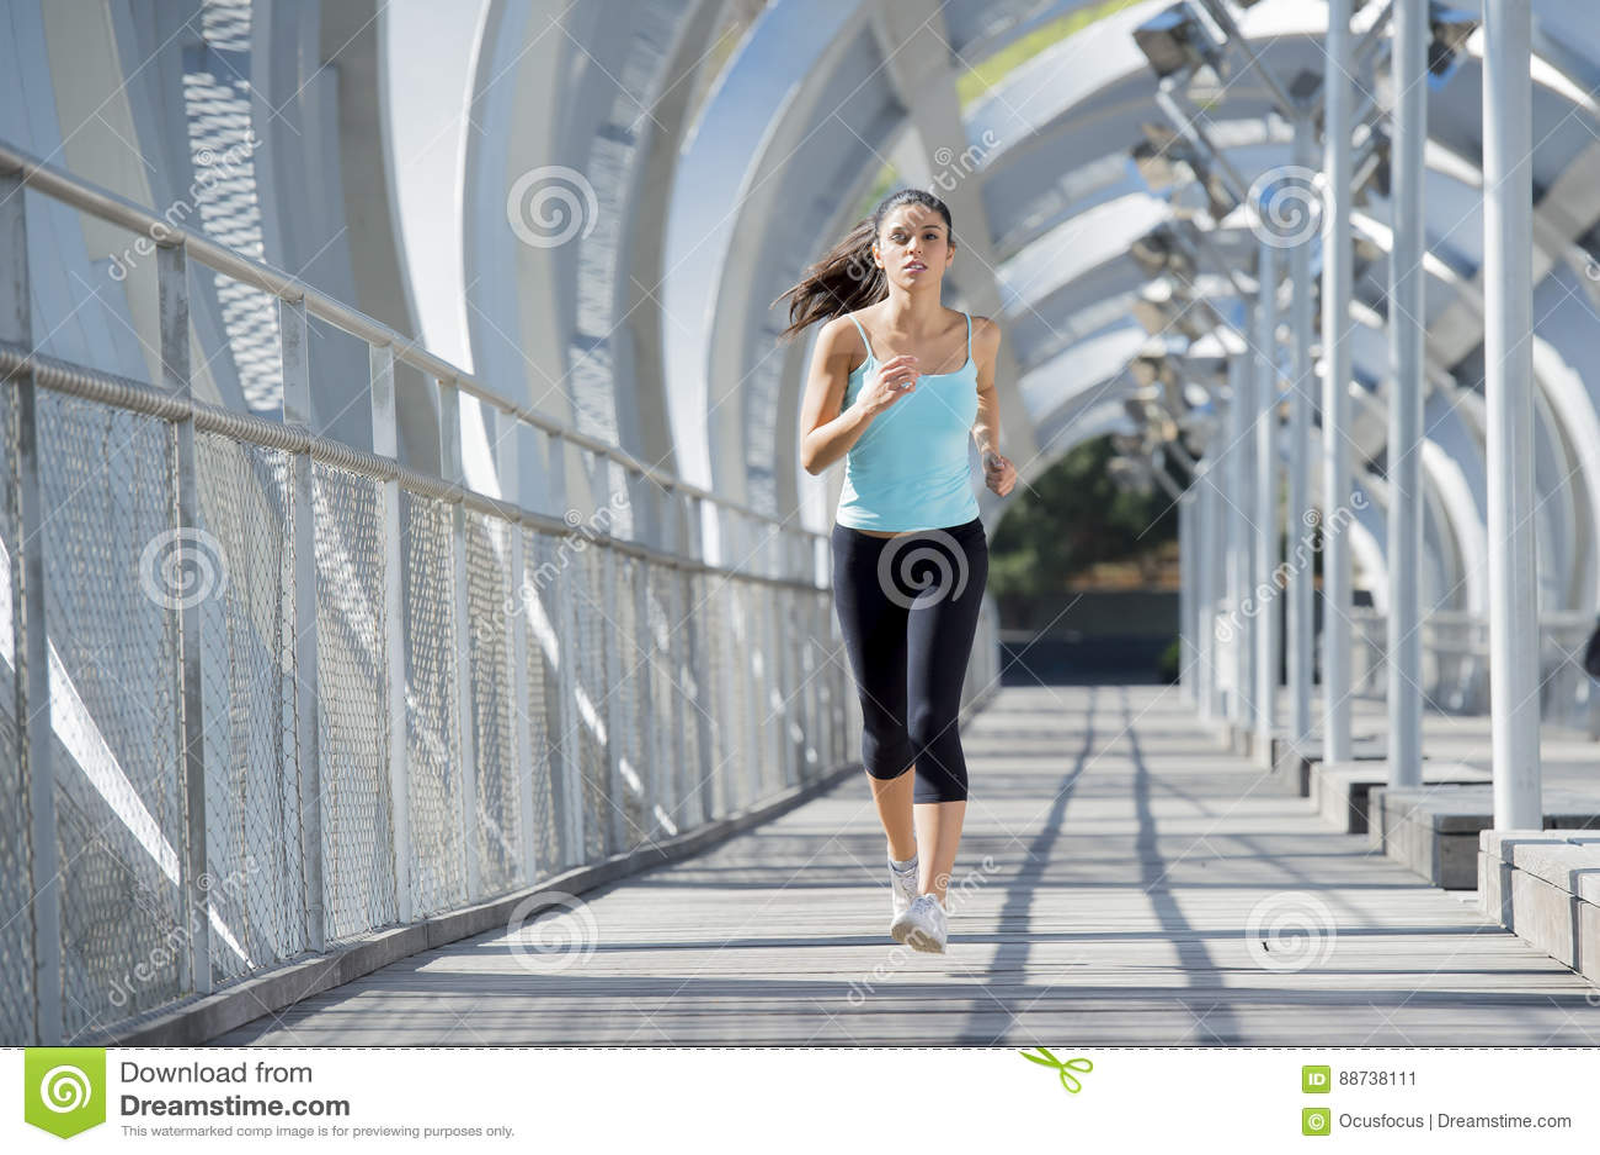 Young beautiful athletic sport woman running and jogging crossing modern metal city bridge